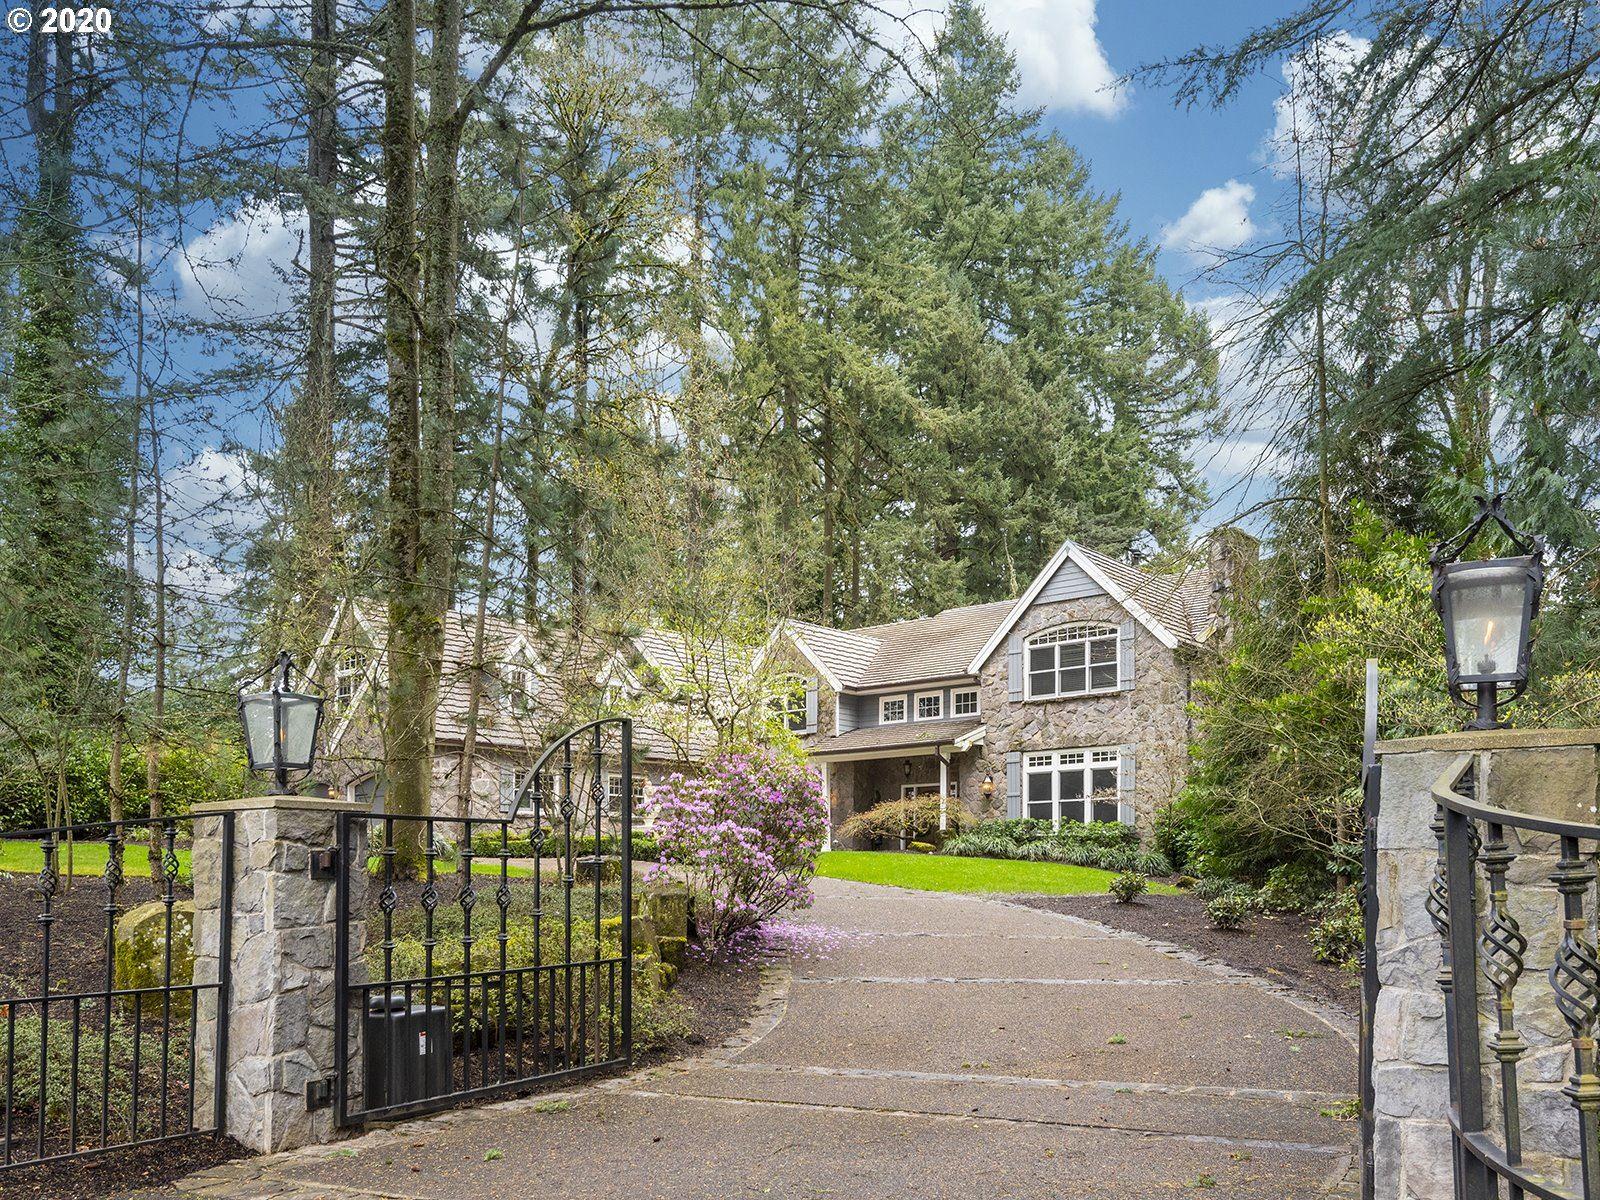 11708 SW SUMMERVILLE AVE, Portland, OR 97219 - MLS#: 20219327